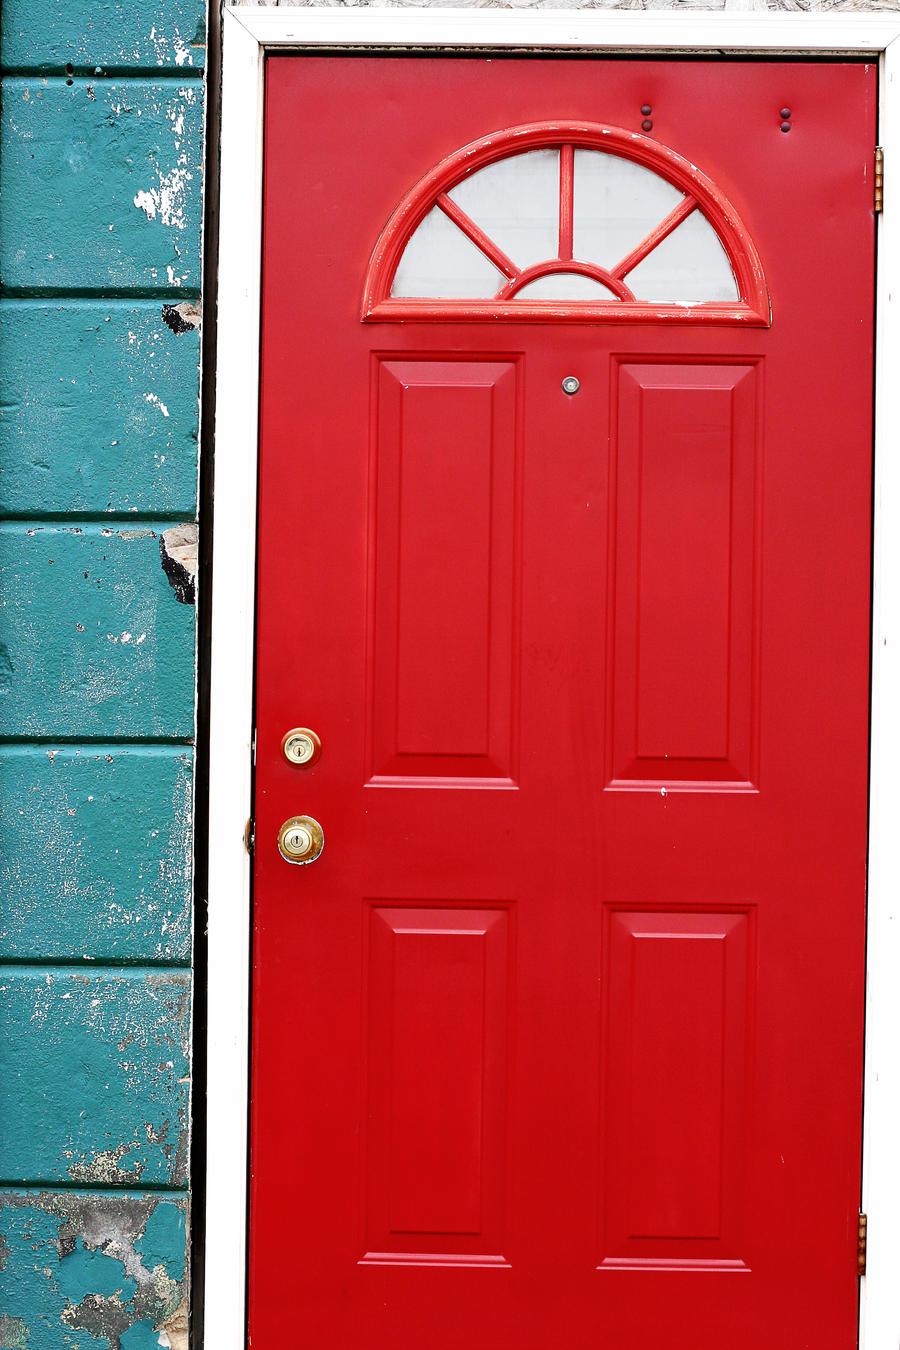 ... red door by shuttered-smiles  sc 1 st  shuttered-smiles - DeviantArt & red door by shuttered-smiles on DeviantArt